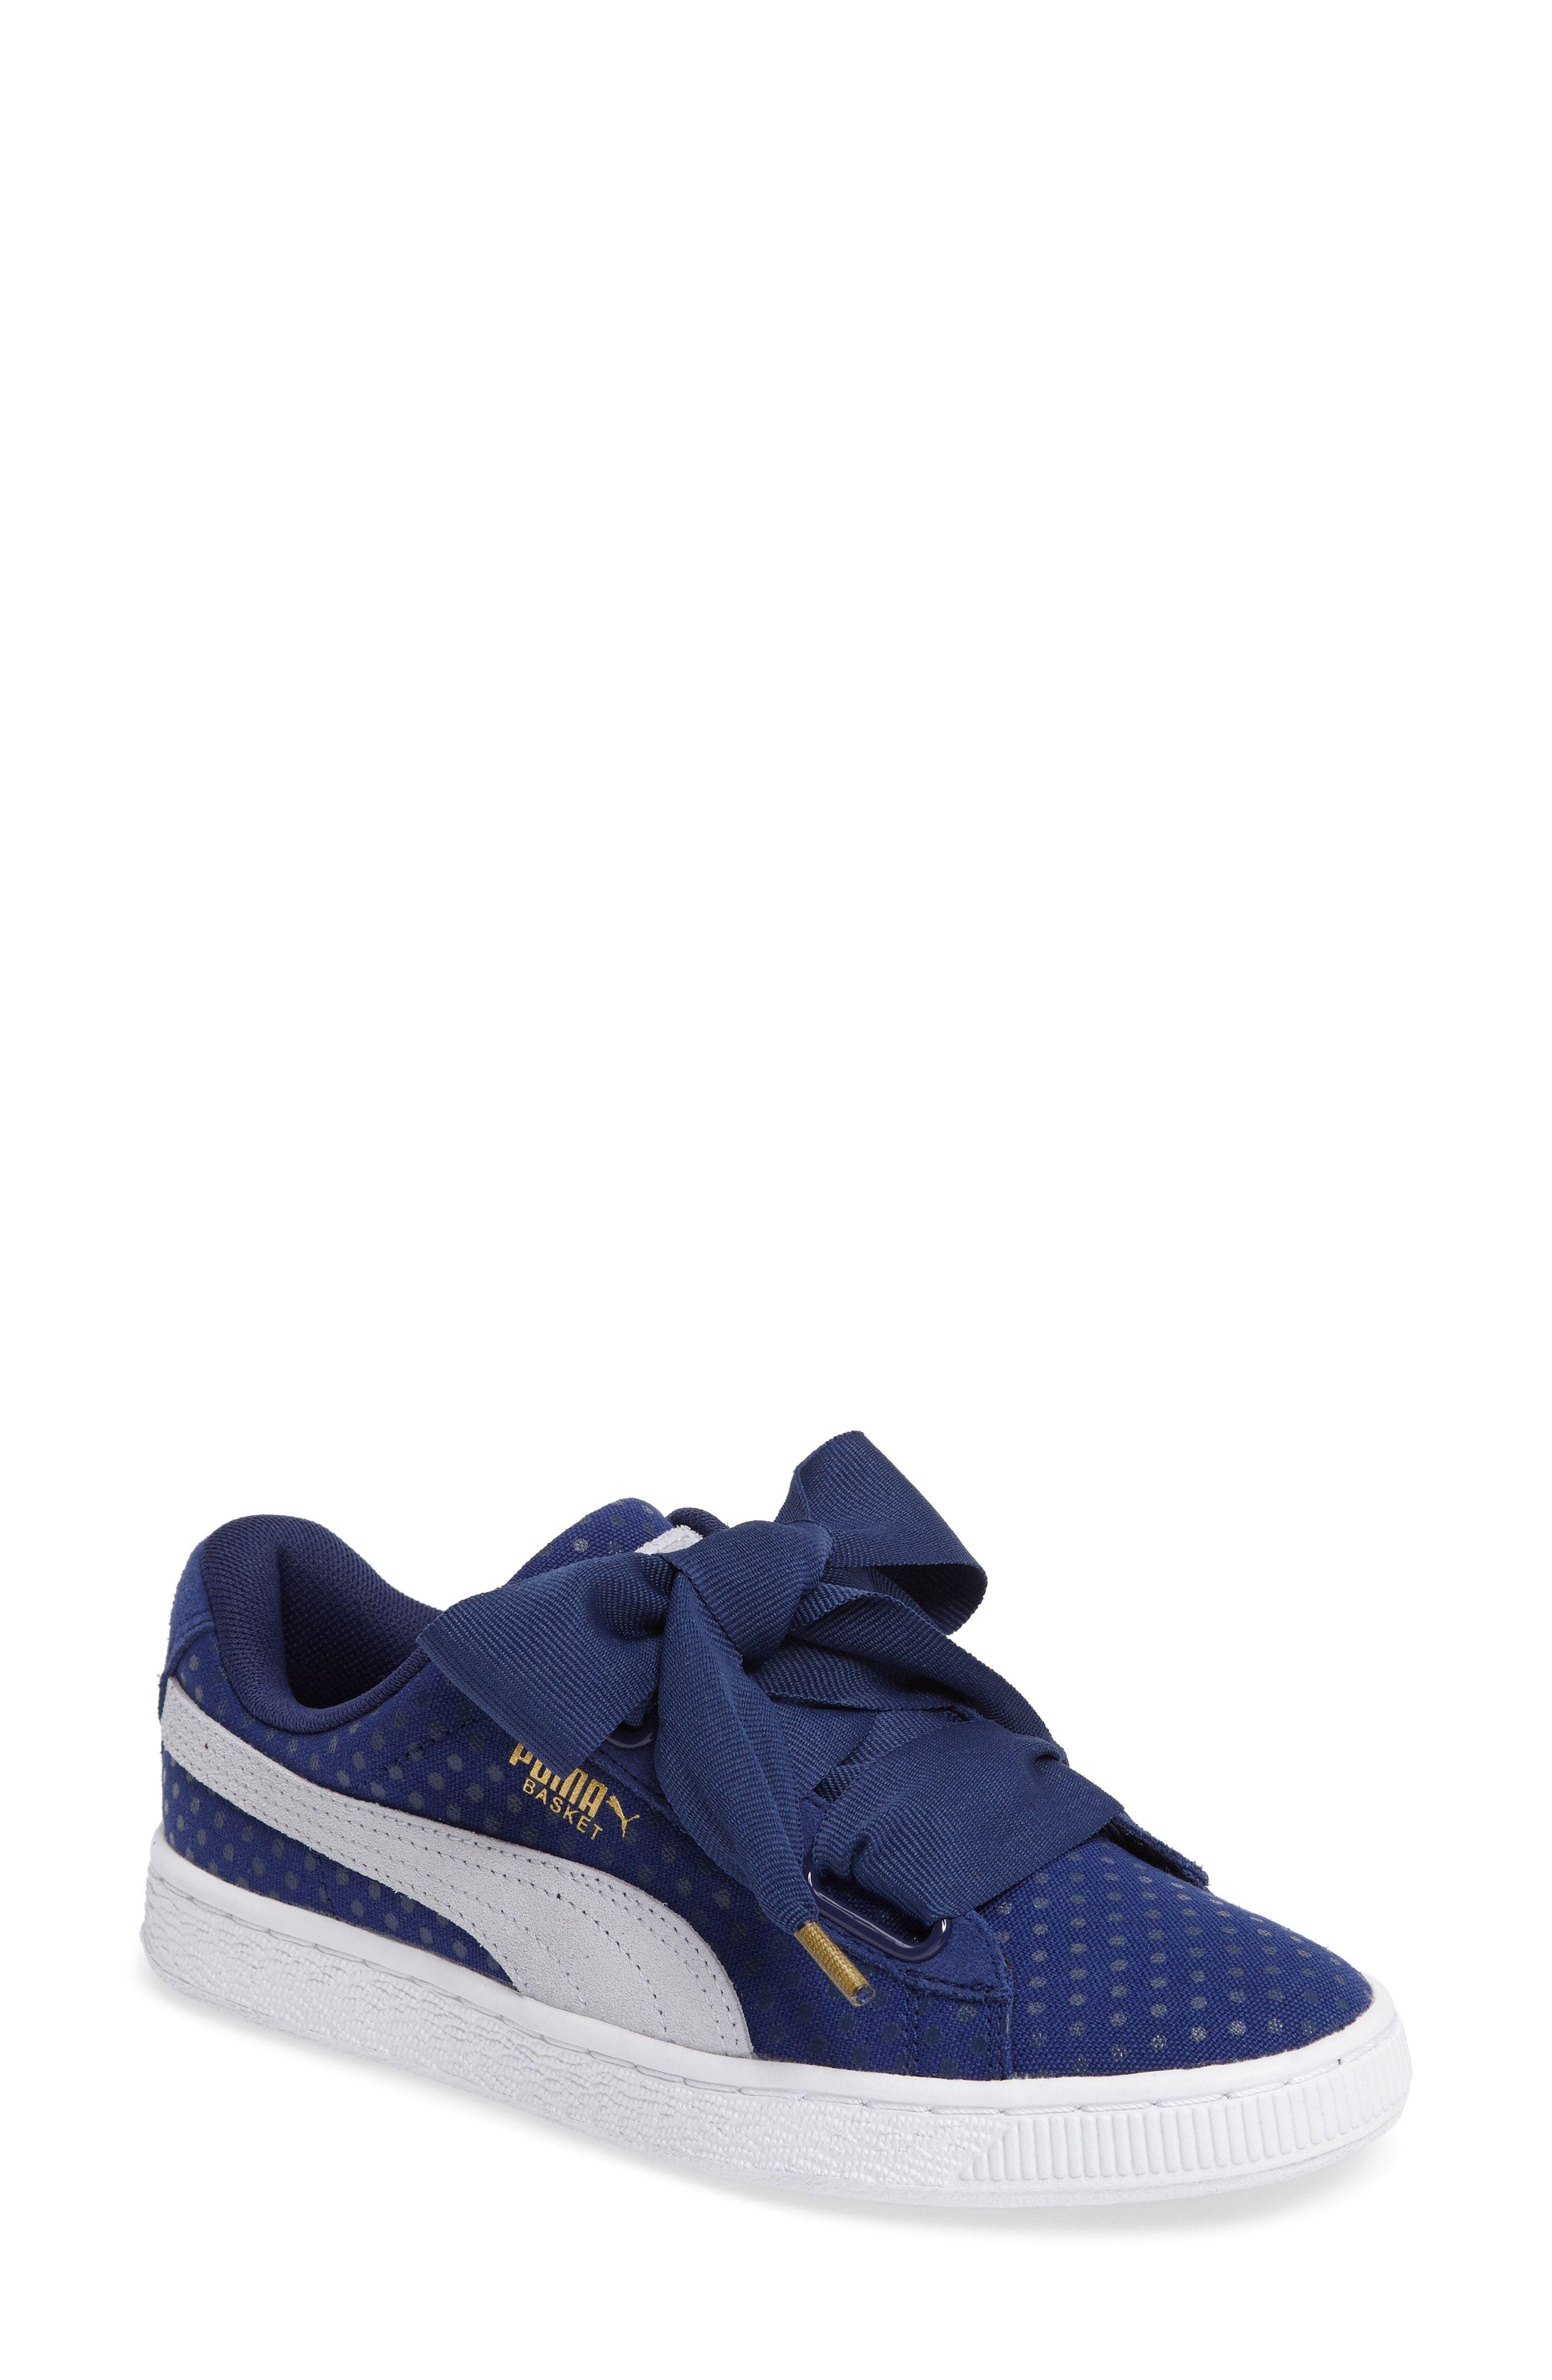 promo code 74ca5 2646a Shop Puma Women'S Basket Heart Denim Casual Sneakers From ...